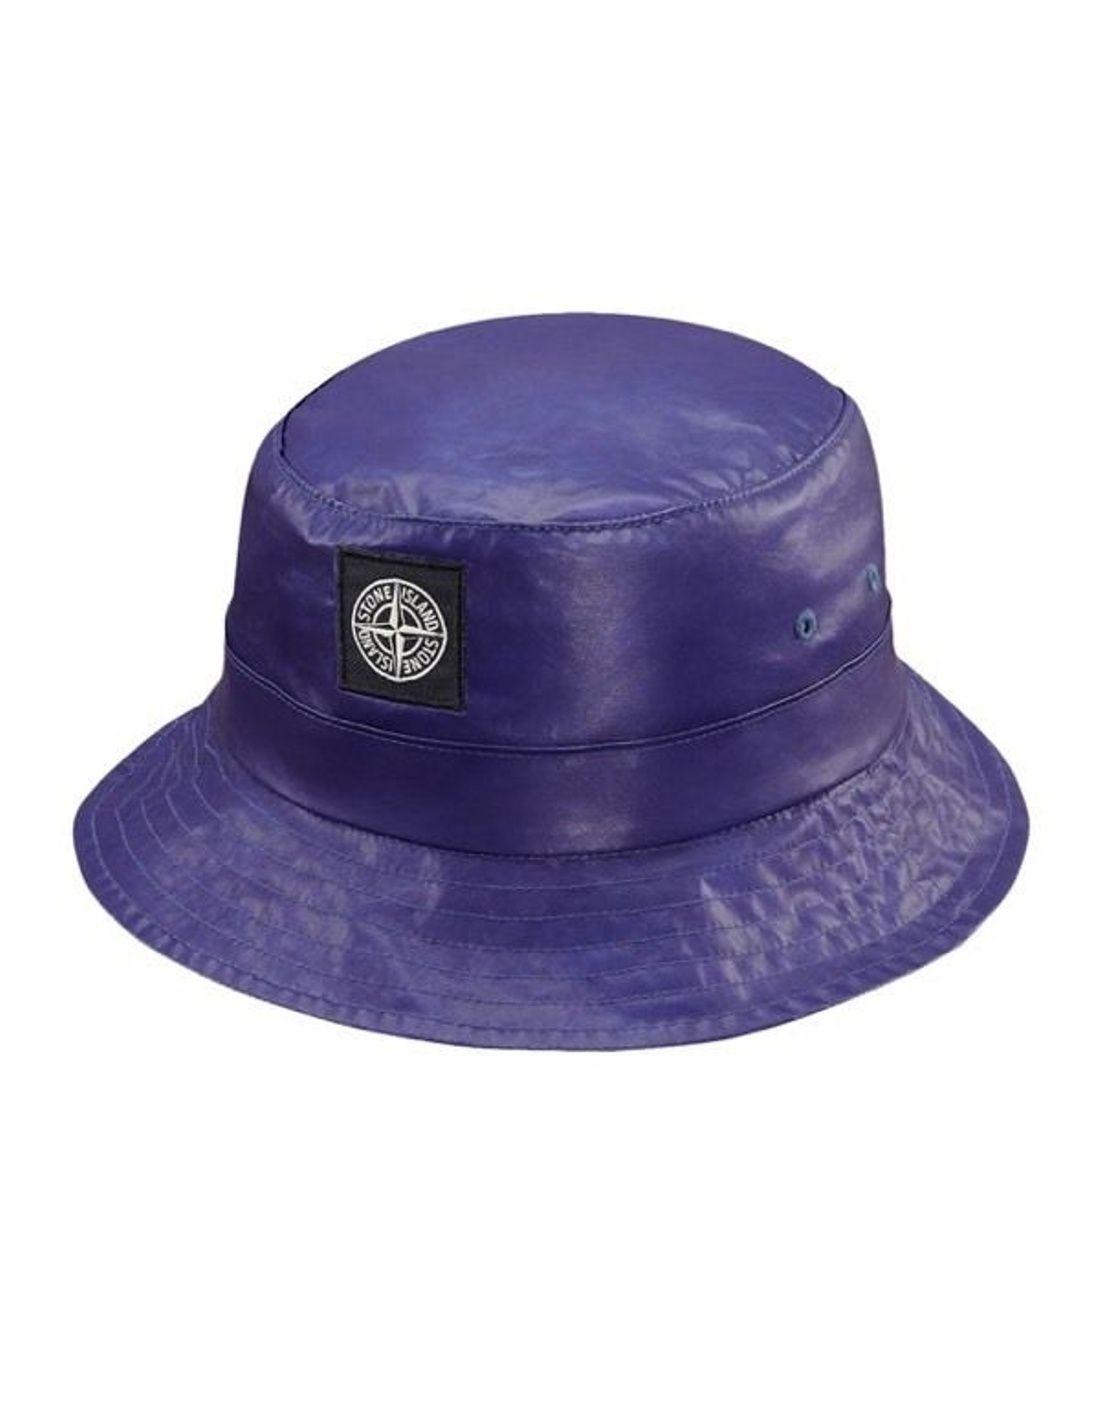 4c54520c Stone Island × Supreme Heat Reactive Bucket Hat Size One Size $144 - Grailed